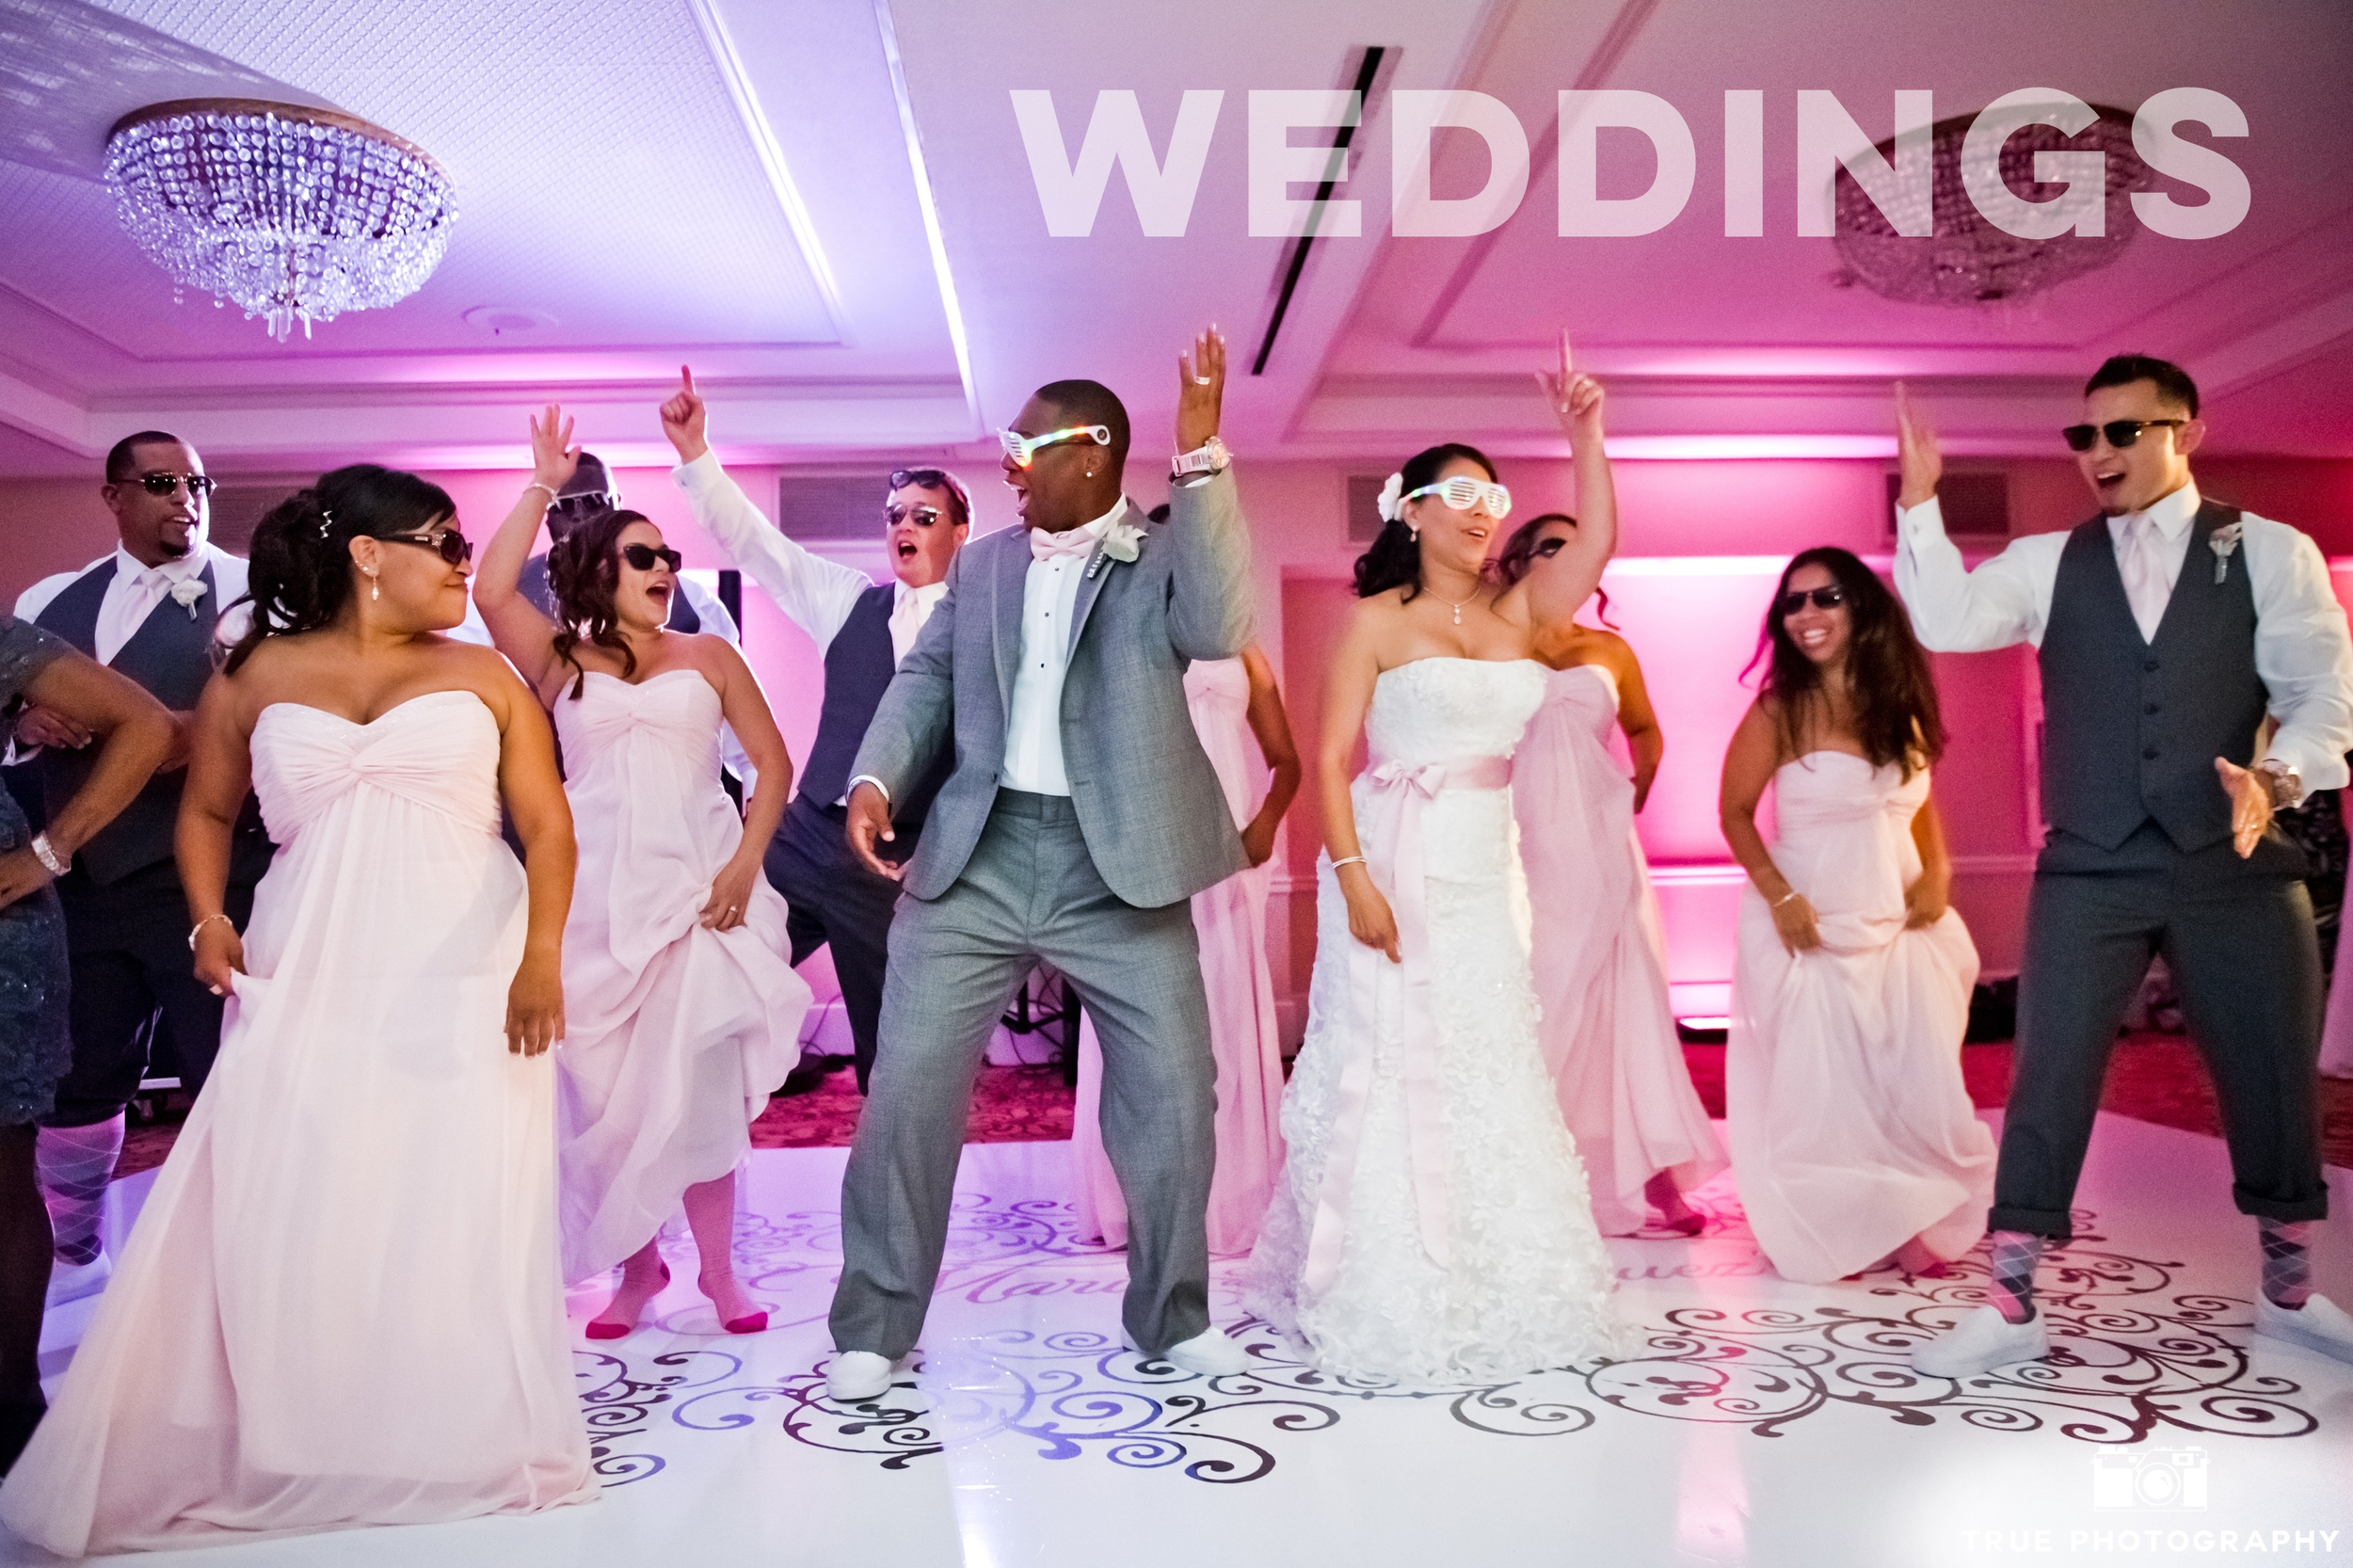 lauberge wedding dance